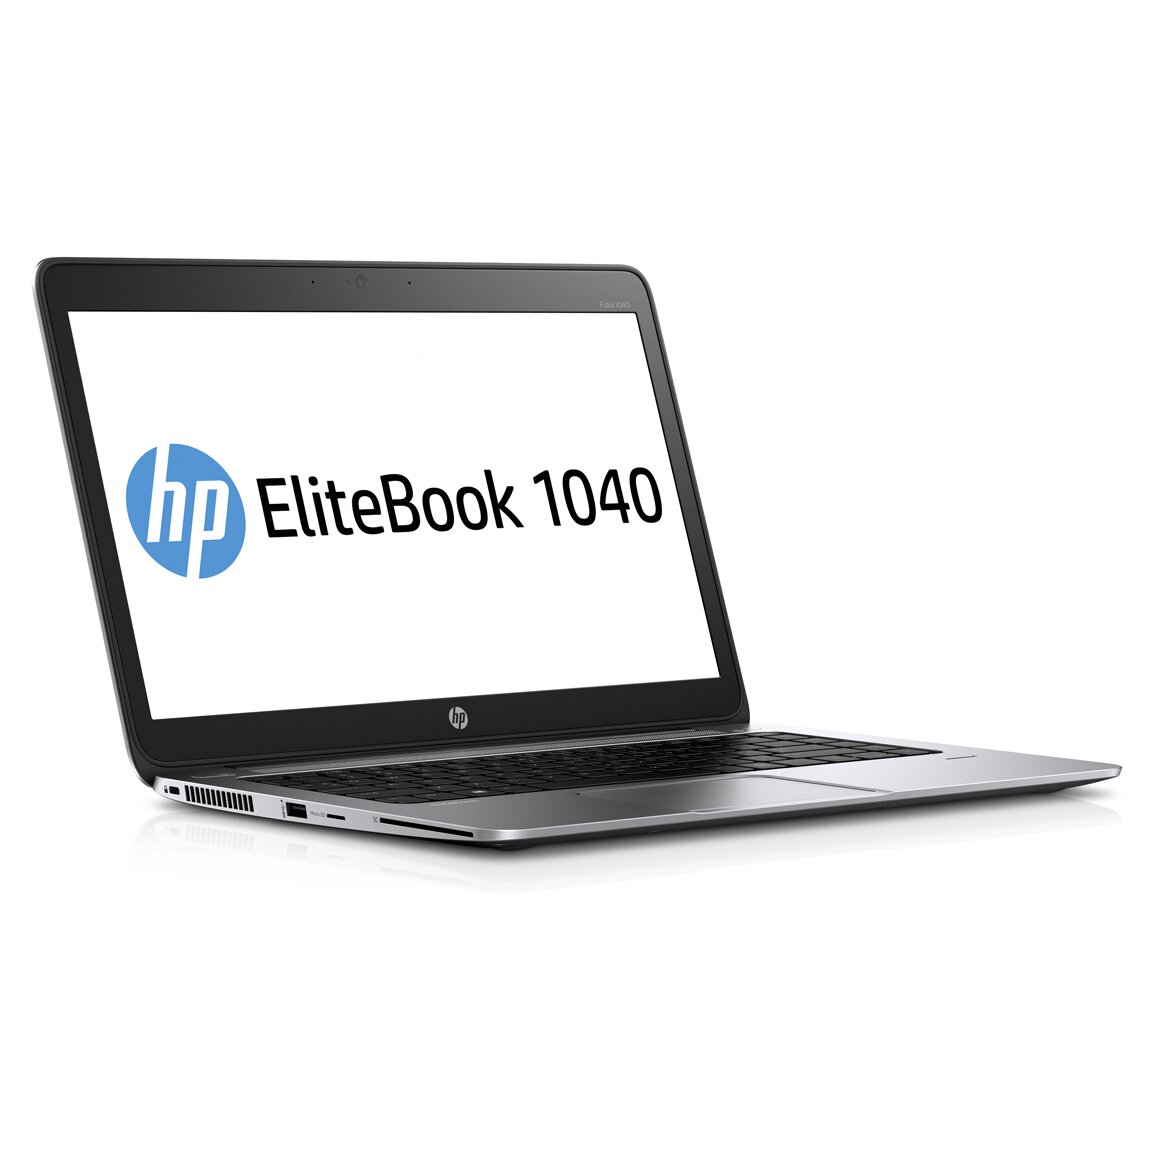 Laptop HP EliteBook 1040 G3 i5-6200U/8GB/256GB SSD/14.0 - (W8H15PA)